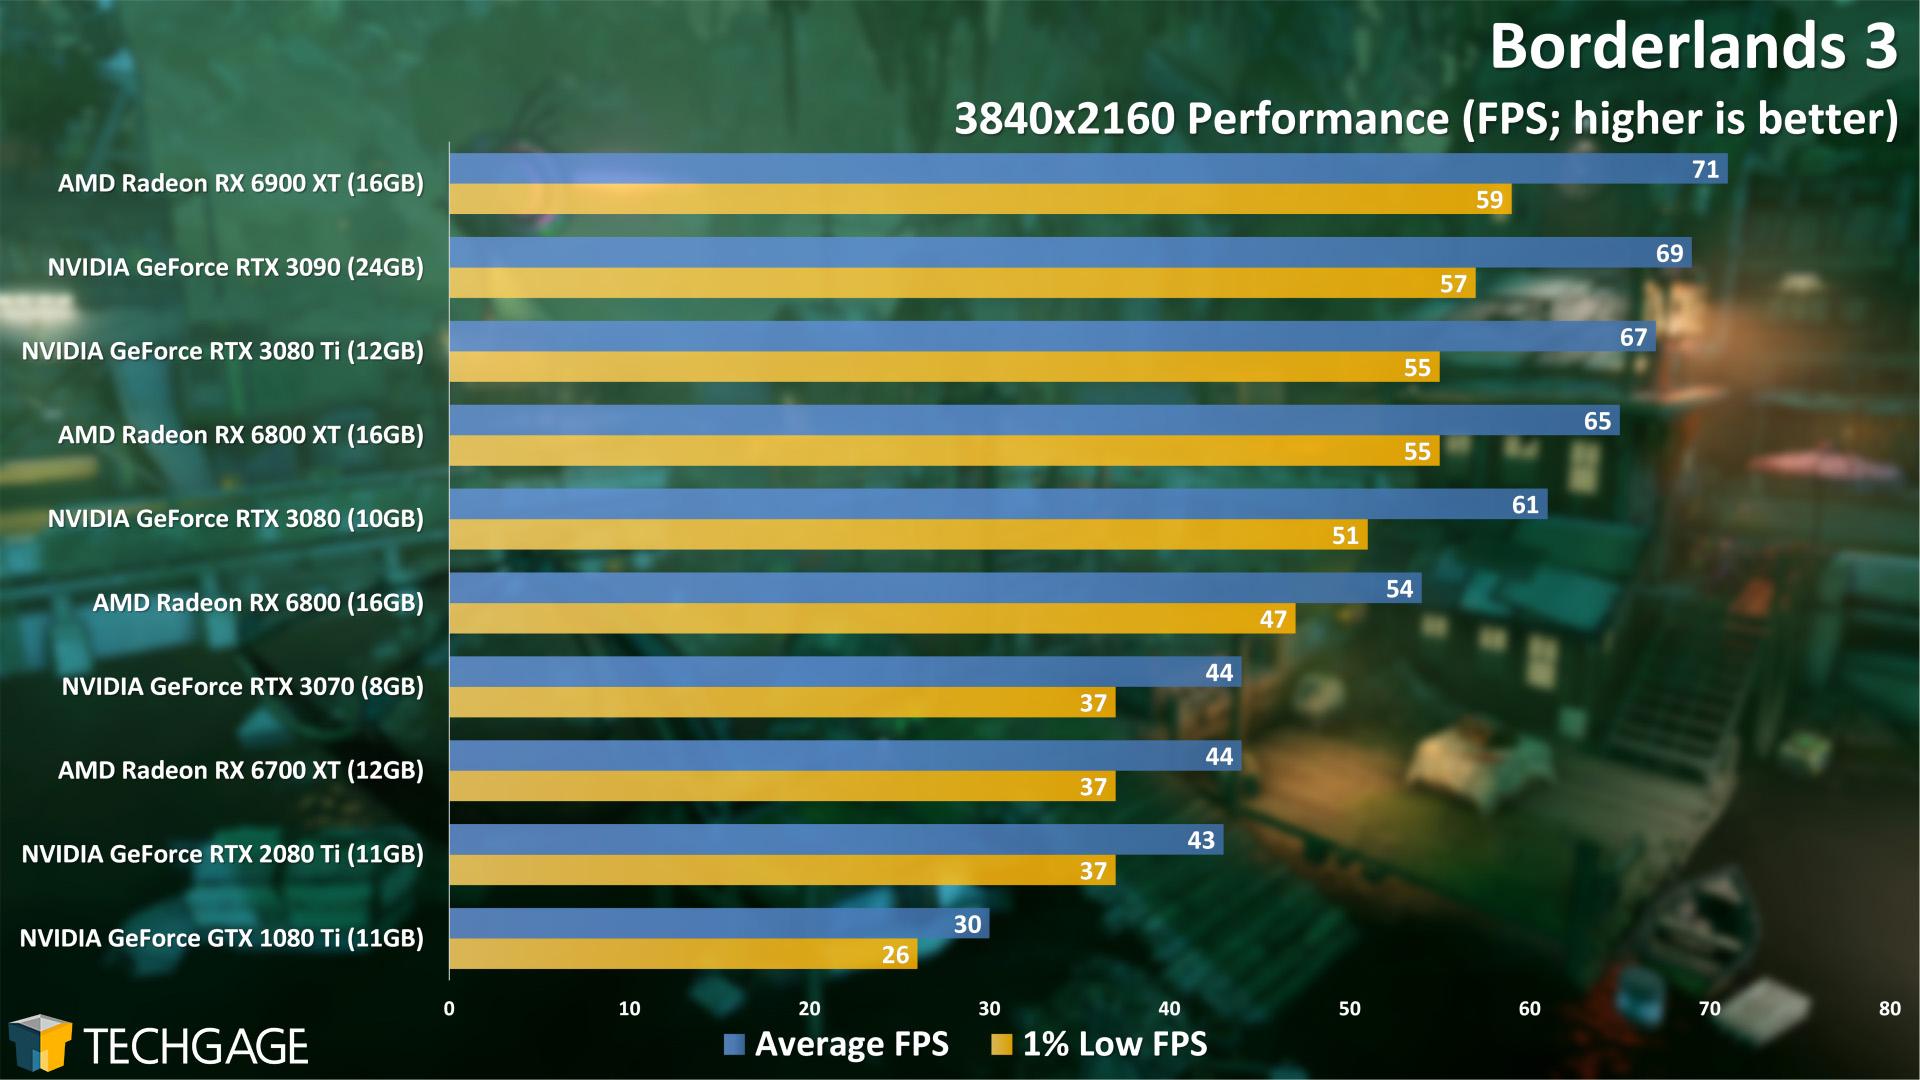 Borderlands 3 - 2160p Performance (NVIDIA GeForce RTX 3080 Ti)